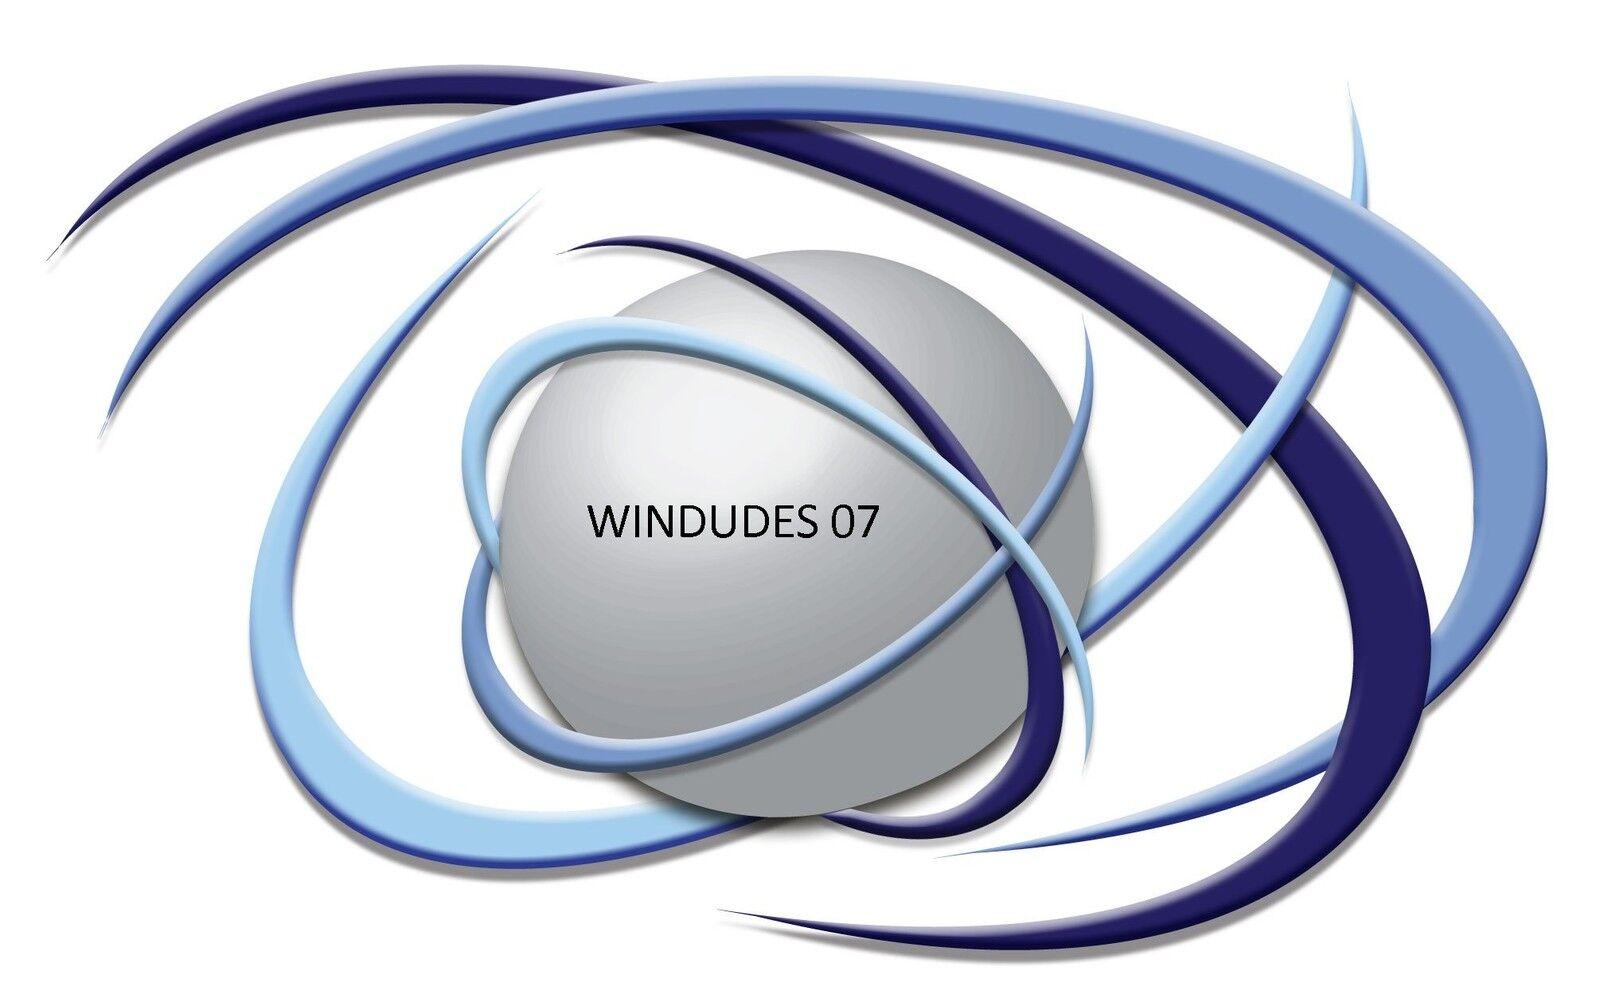 windudes07